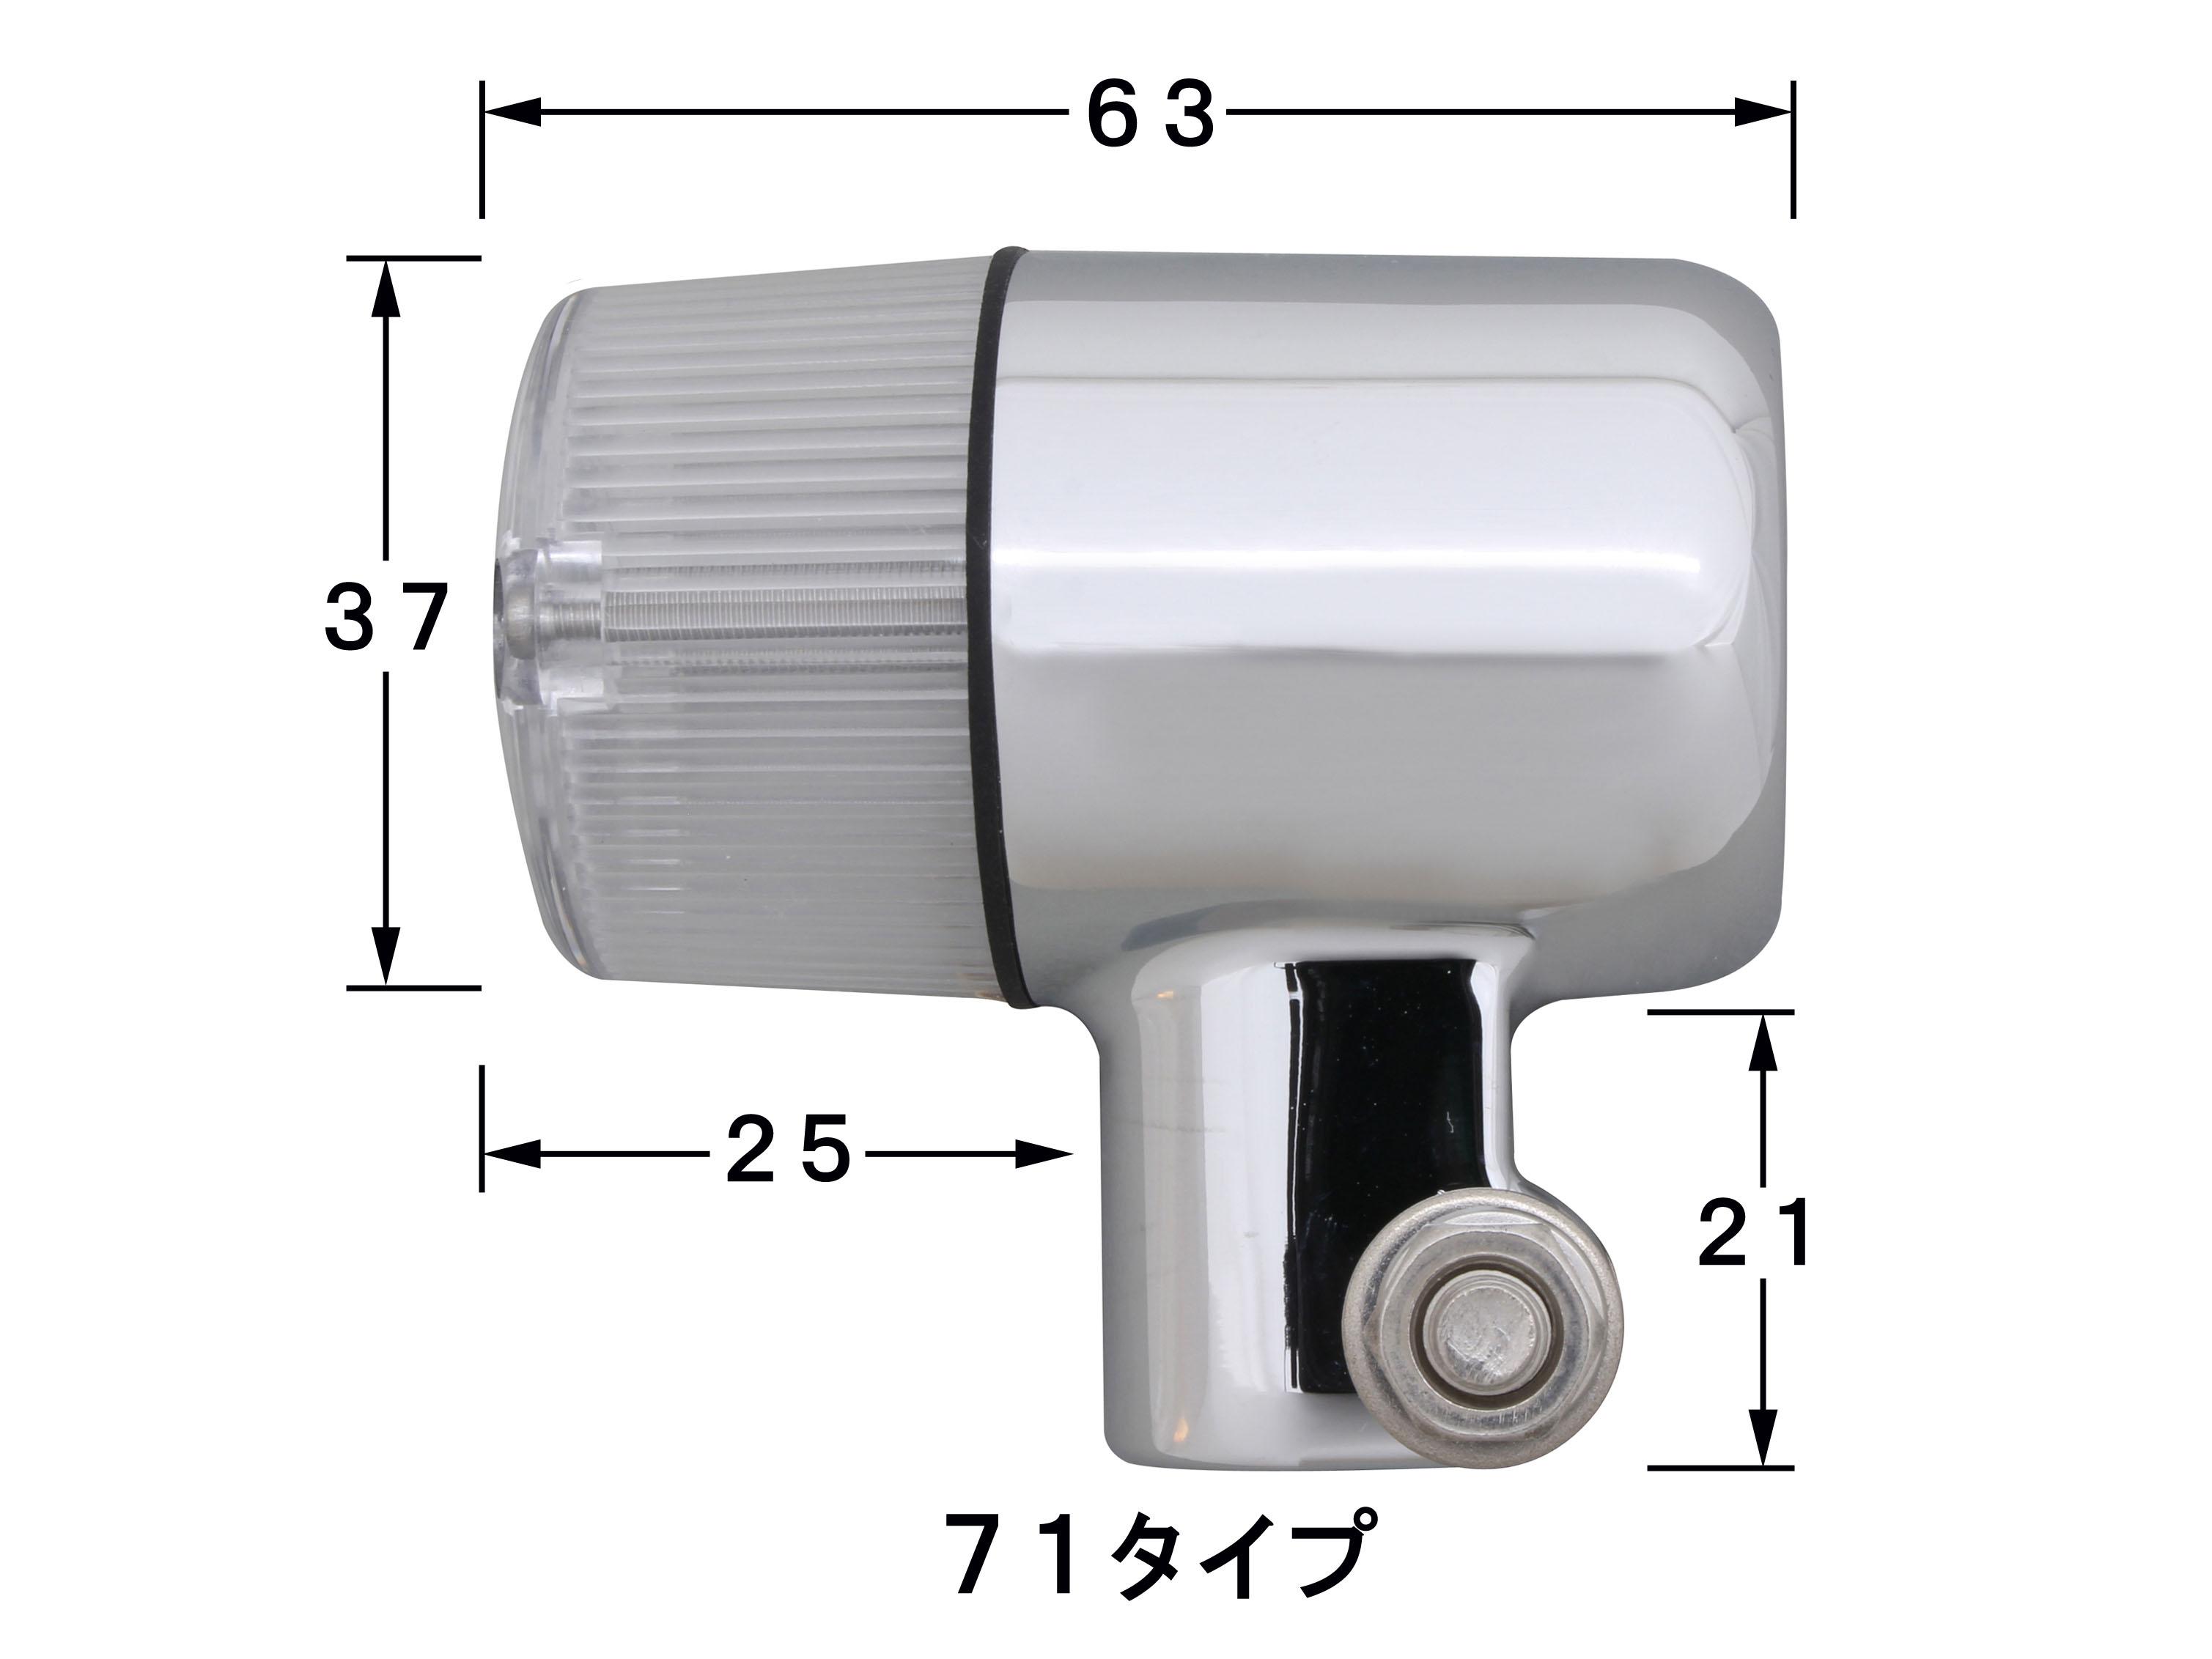 【POSH】TYPE71方向燈組(車種專用) - 「Webike-摩托百貨」